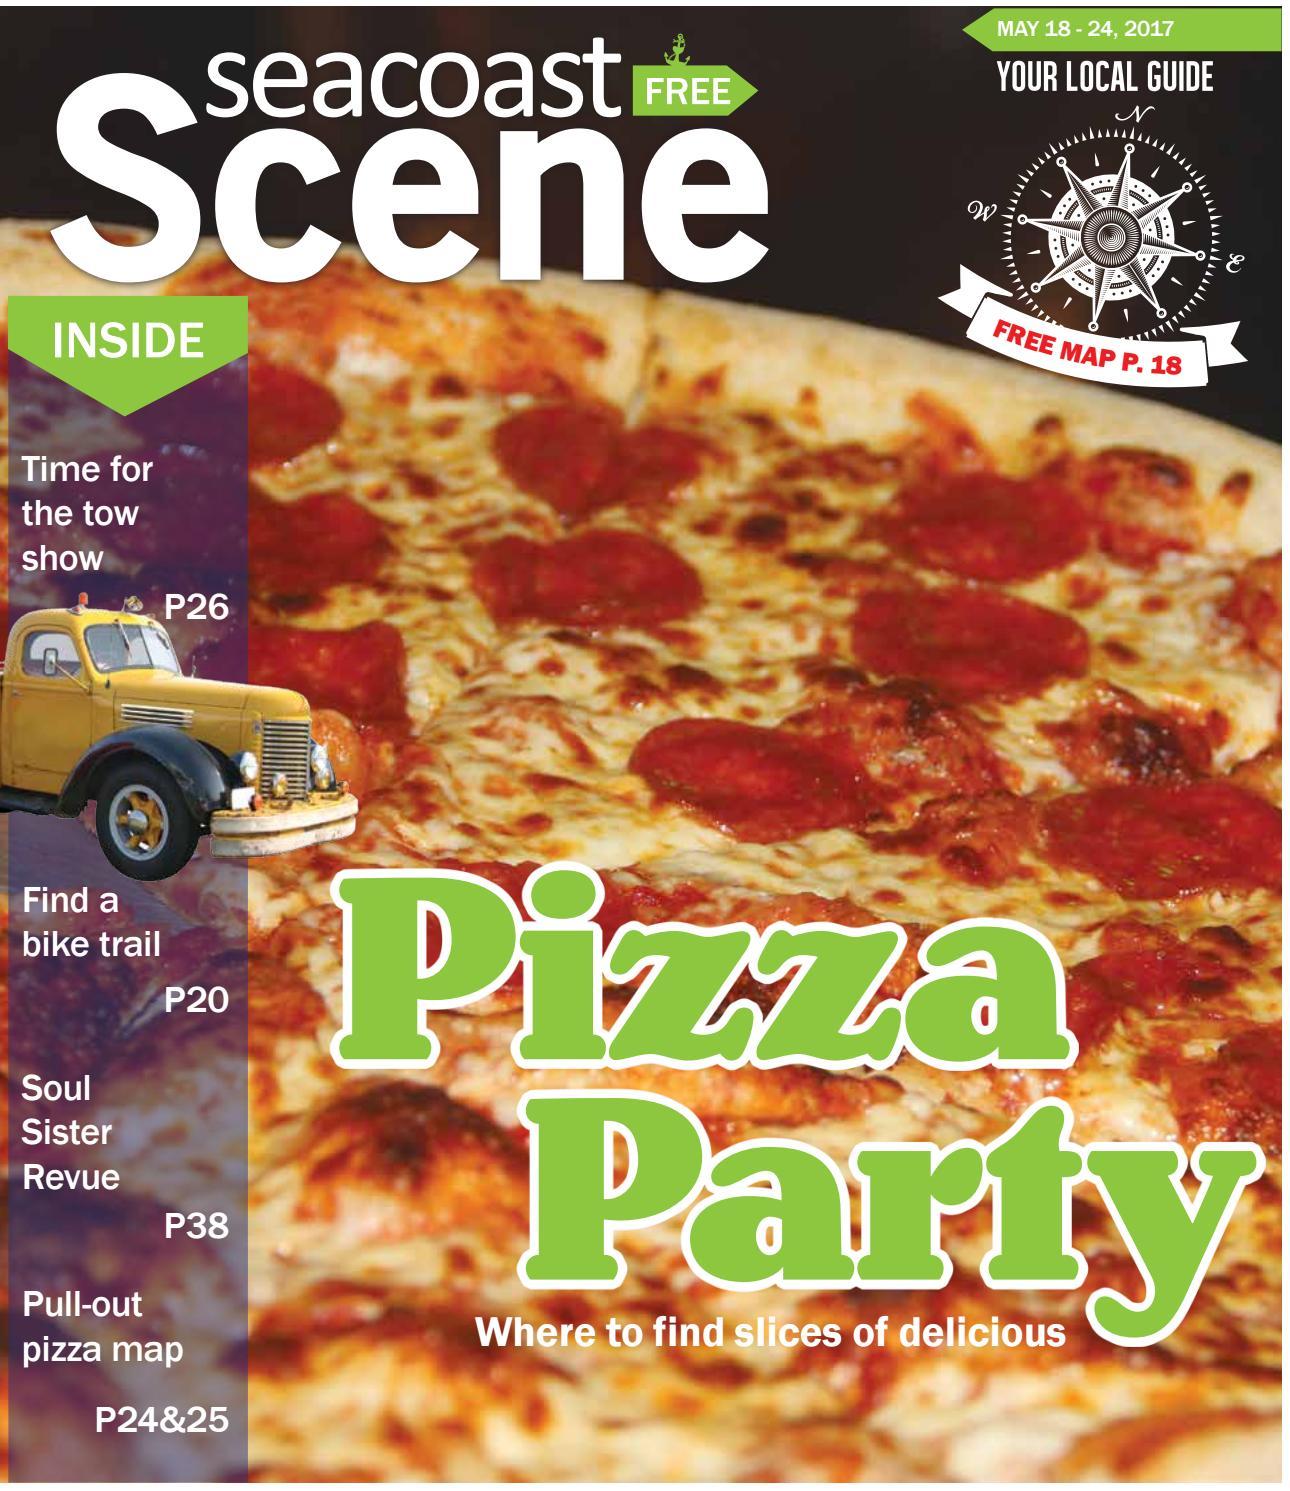 Seacoast Scene 5/18/17 by Seacoast Scene - issuu